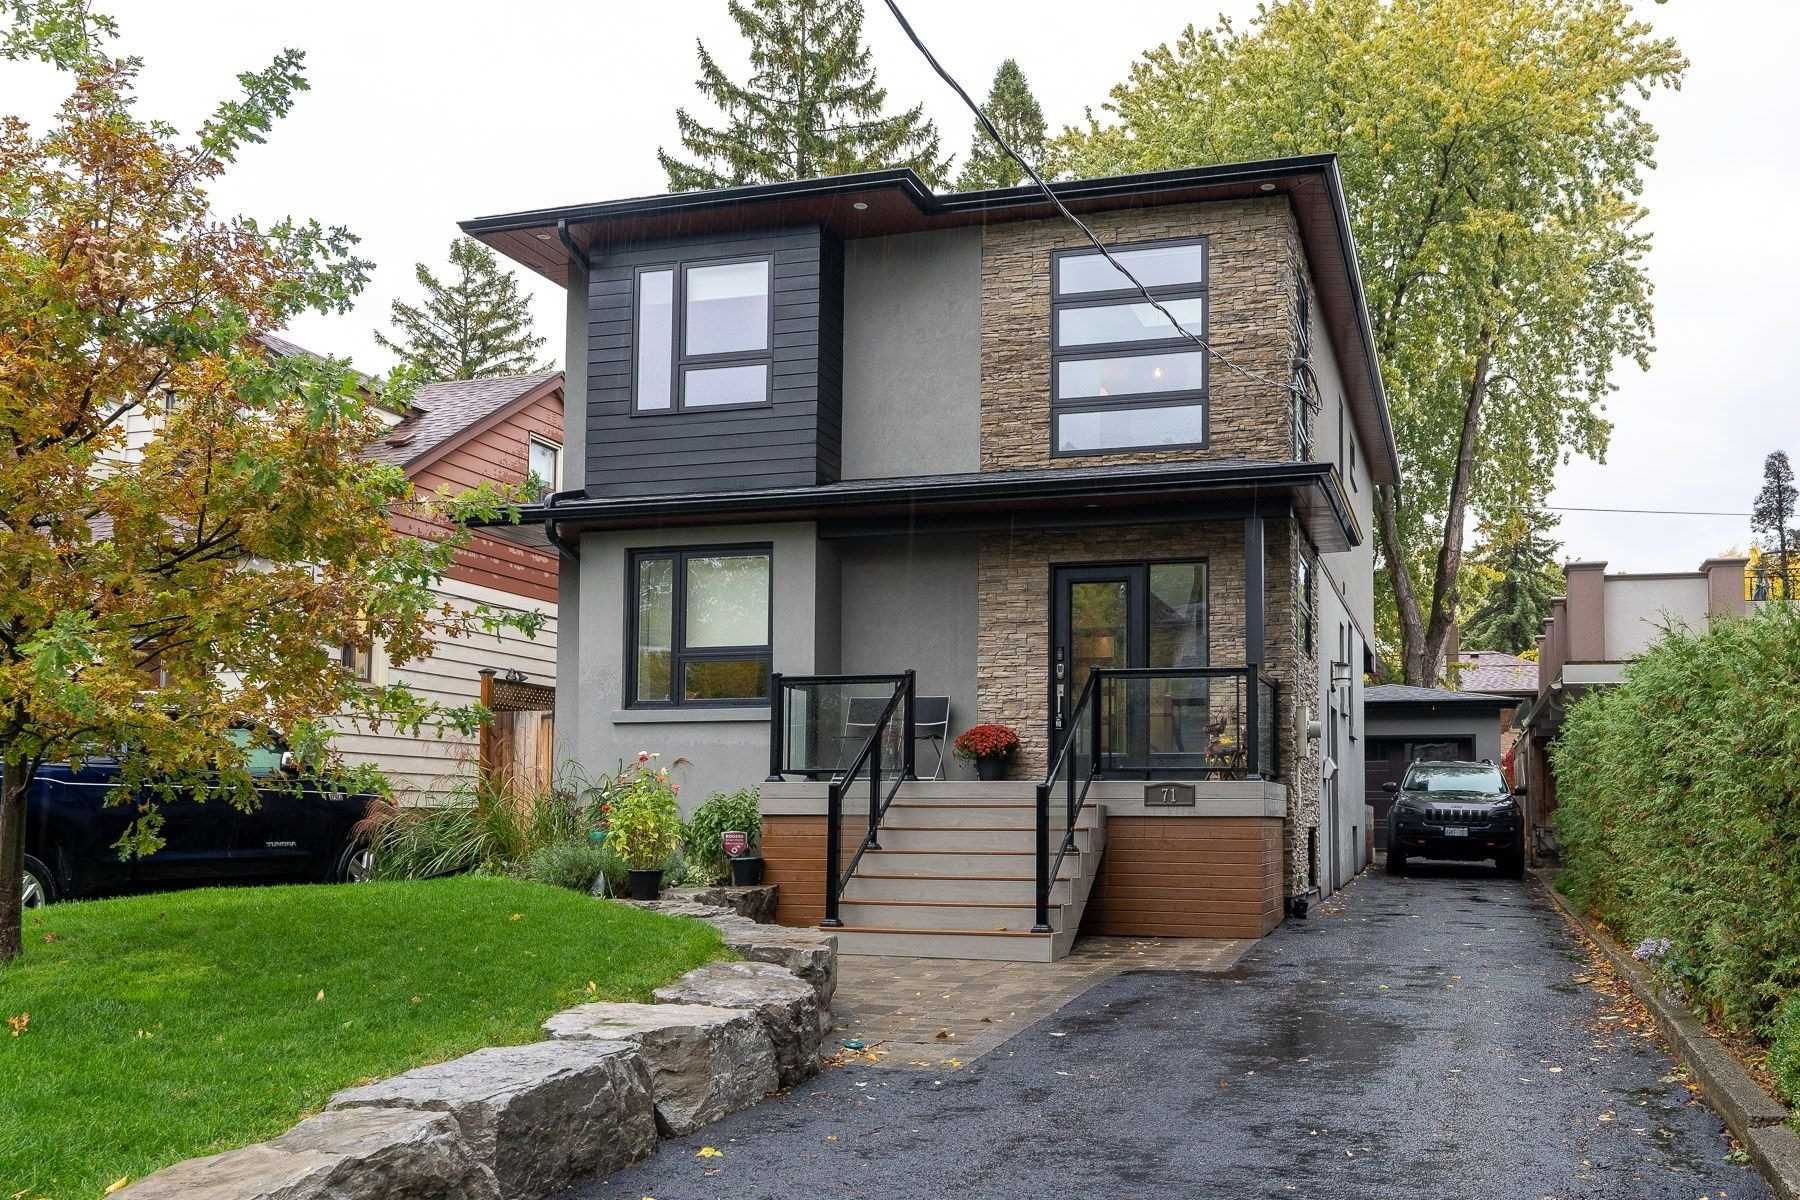 Main Photo: 71 Dorset Road in Toronto: Cliffcrest House (2-Storey) for sale (Toronto E08)  : MLS®# E4956494